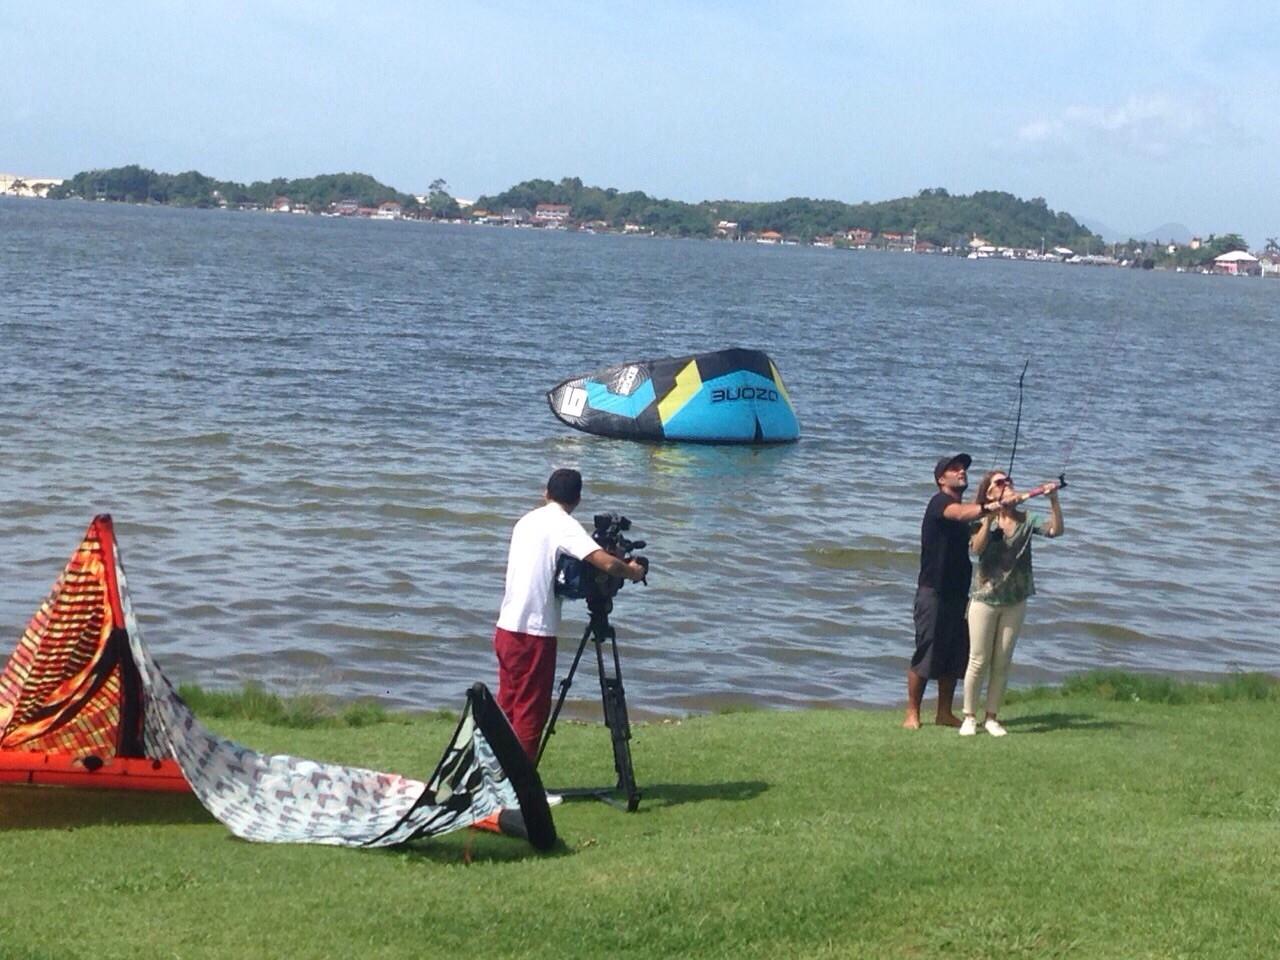 Programa mostra kitesurf (Foto: RBS TV/Divulgação)